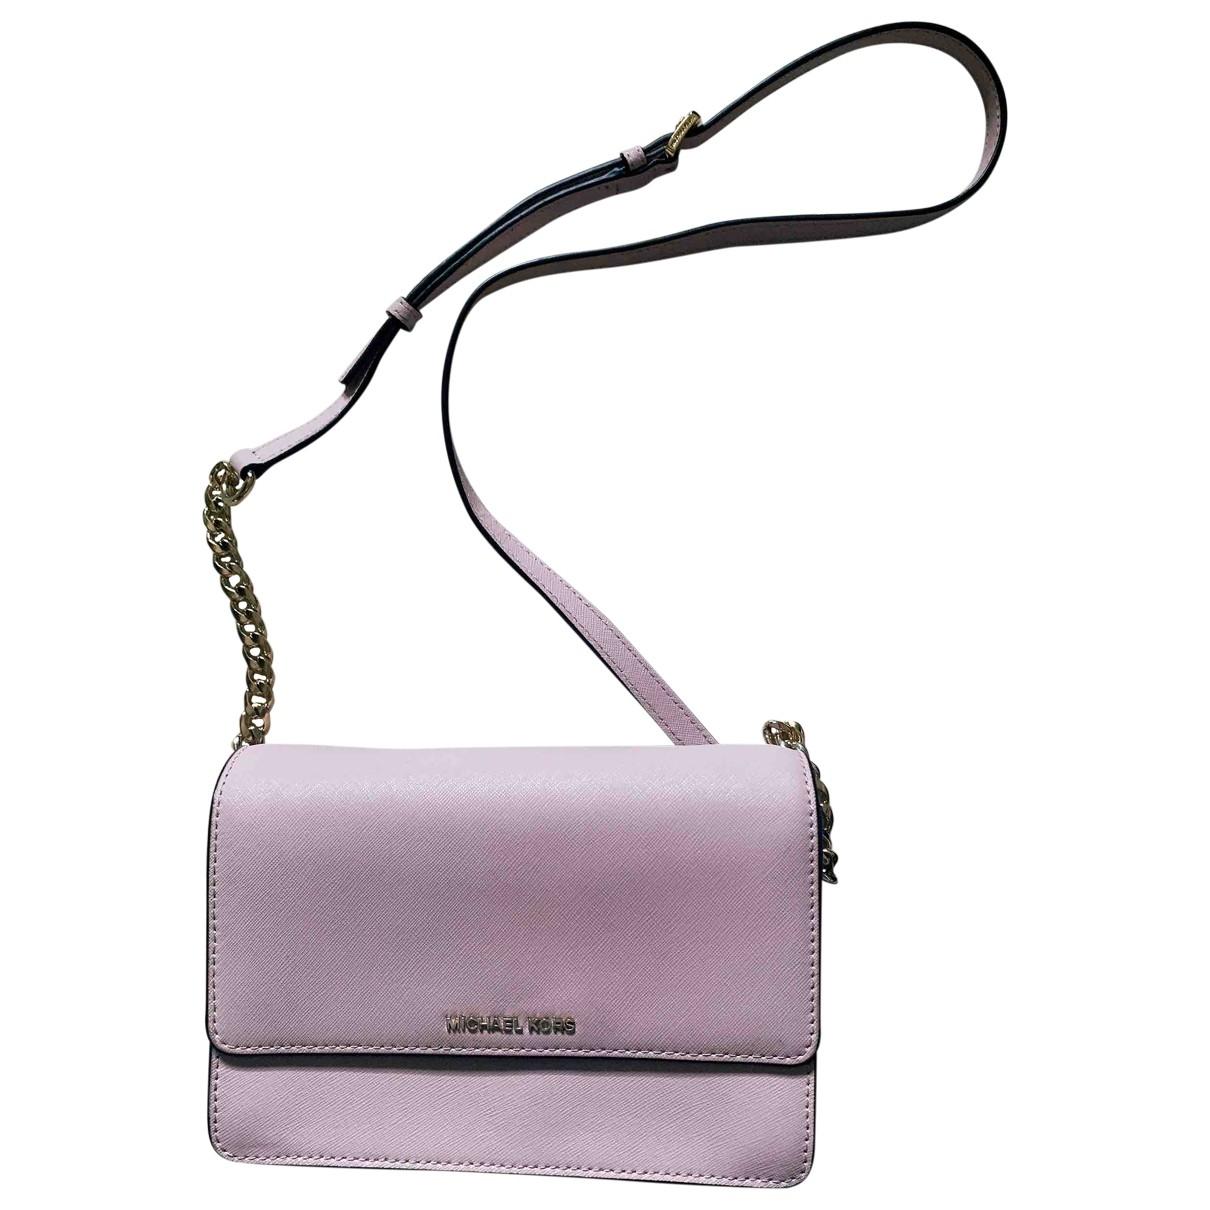 Michael Kors \N Pink Leather Clutch bag for Women \N